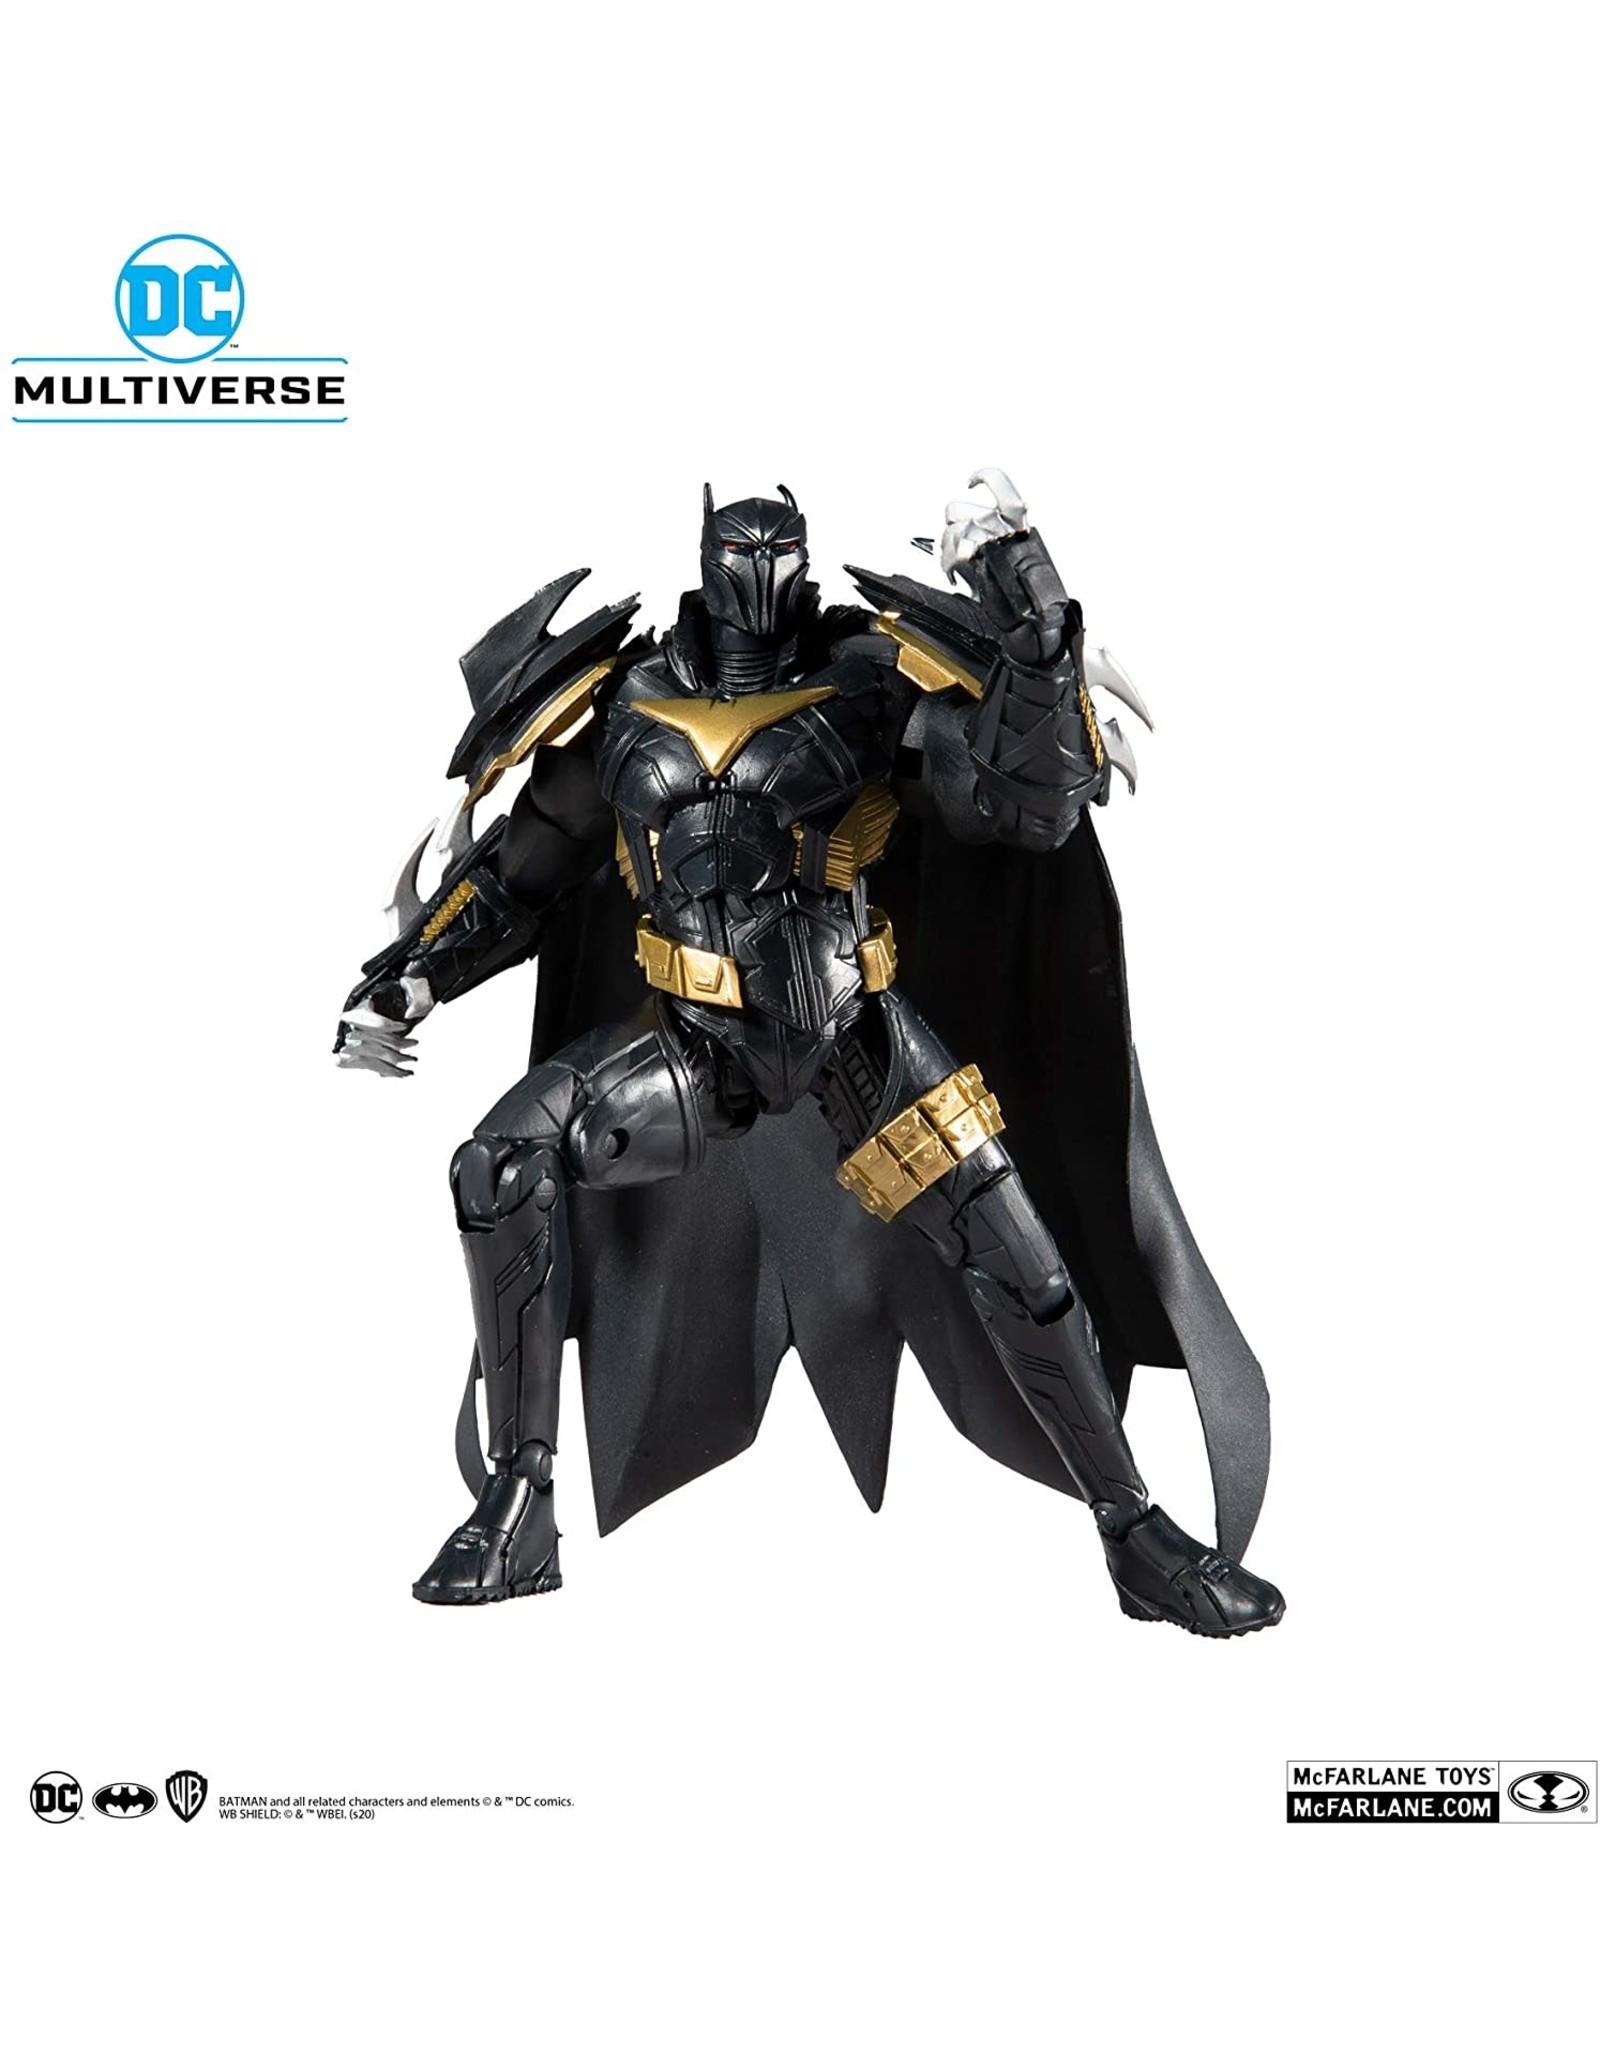 "McFarlane Toys McFarlane Toys DC Multiverse Azrael in Batman Armor: Batman: Curse of The White Knight 7"" Action Figure"